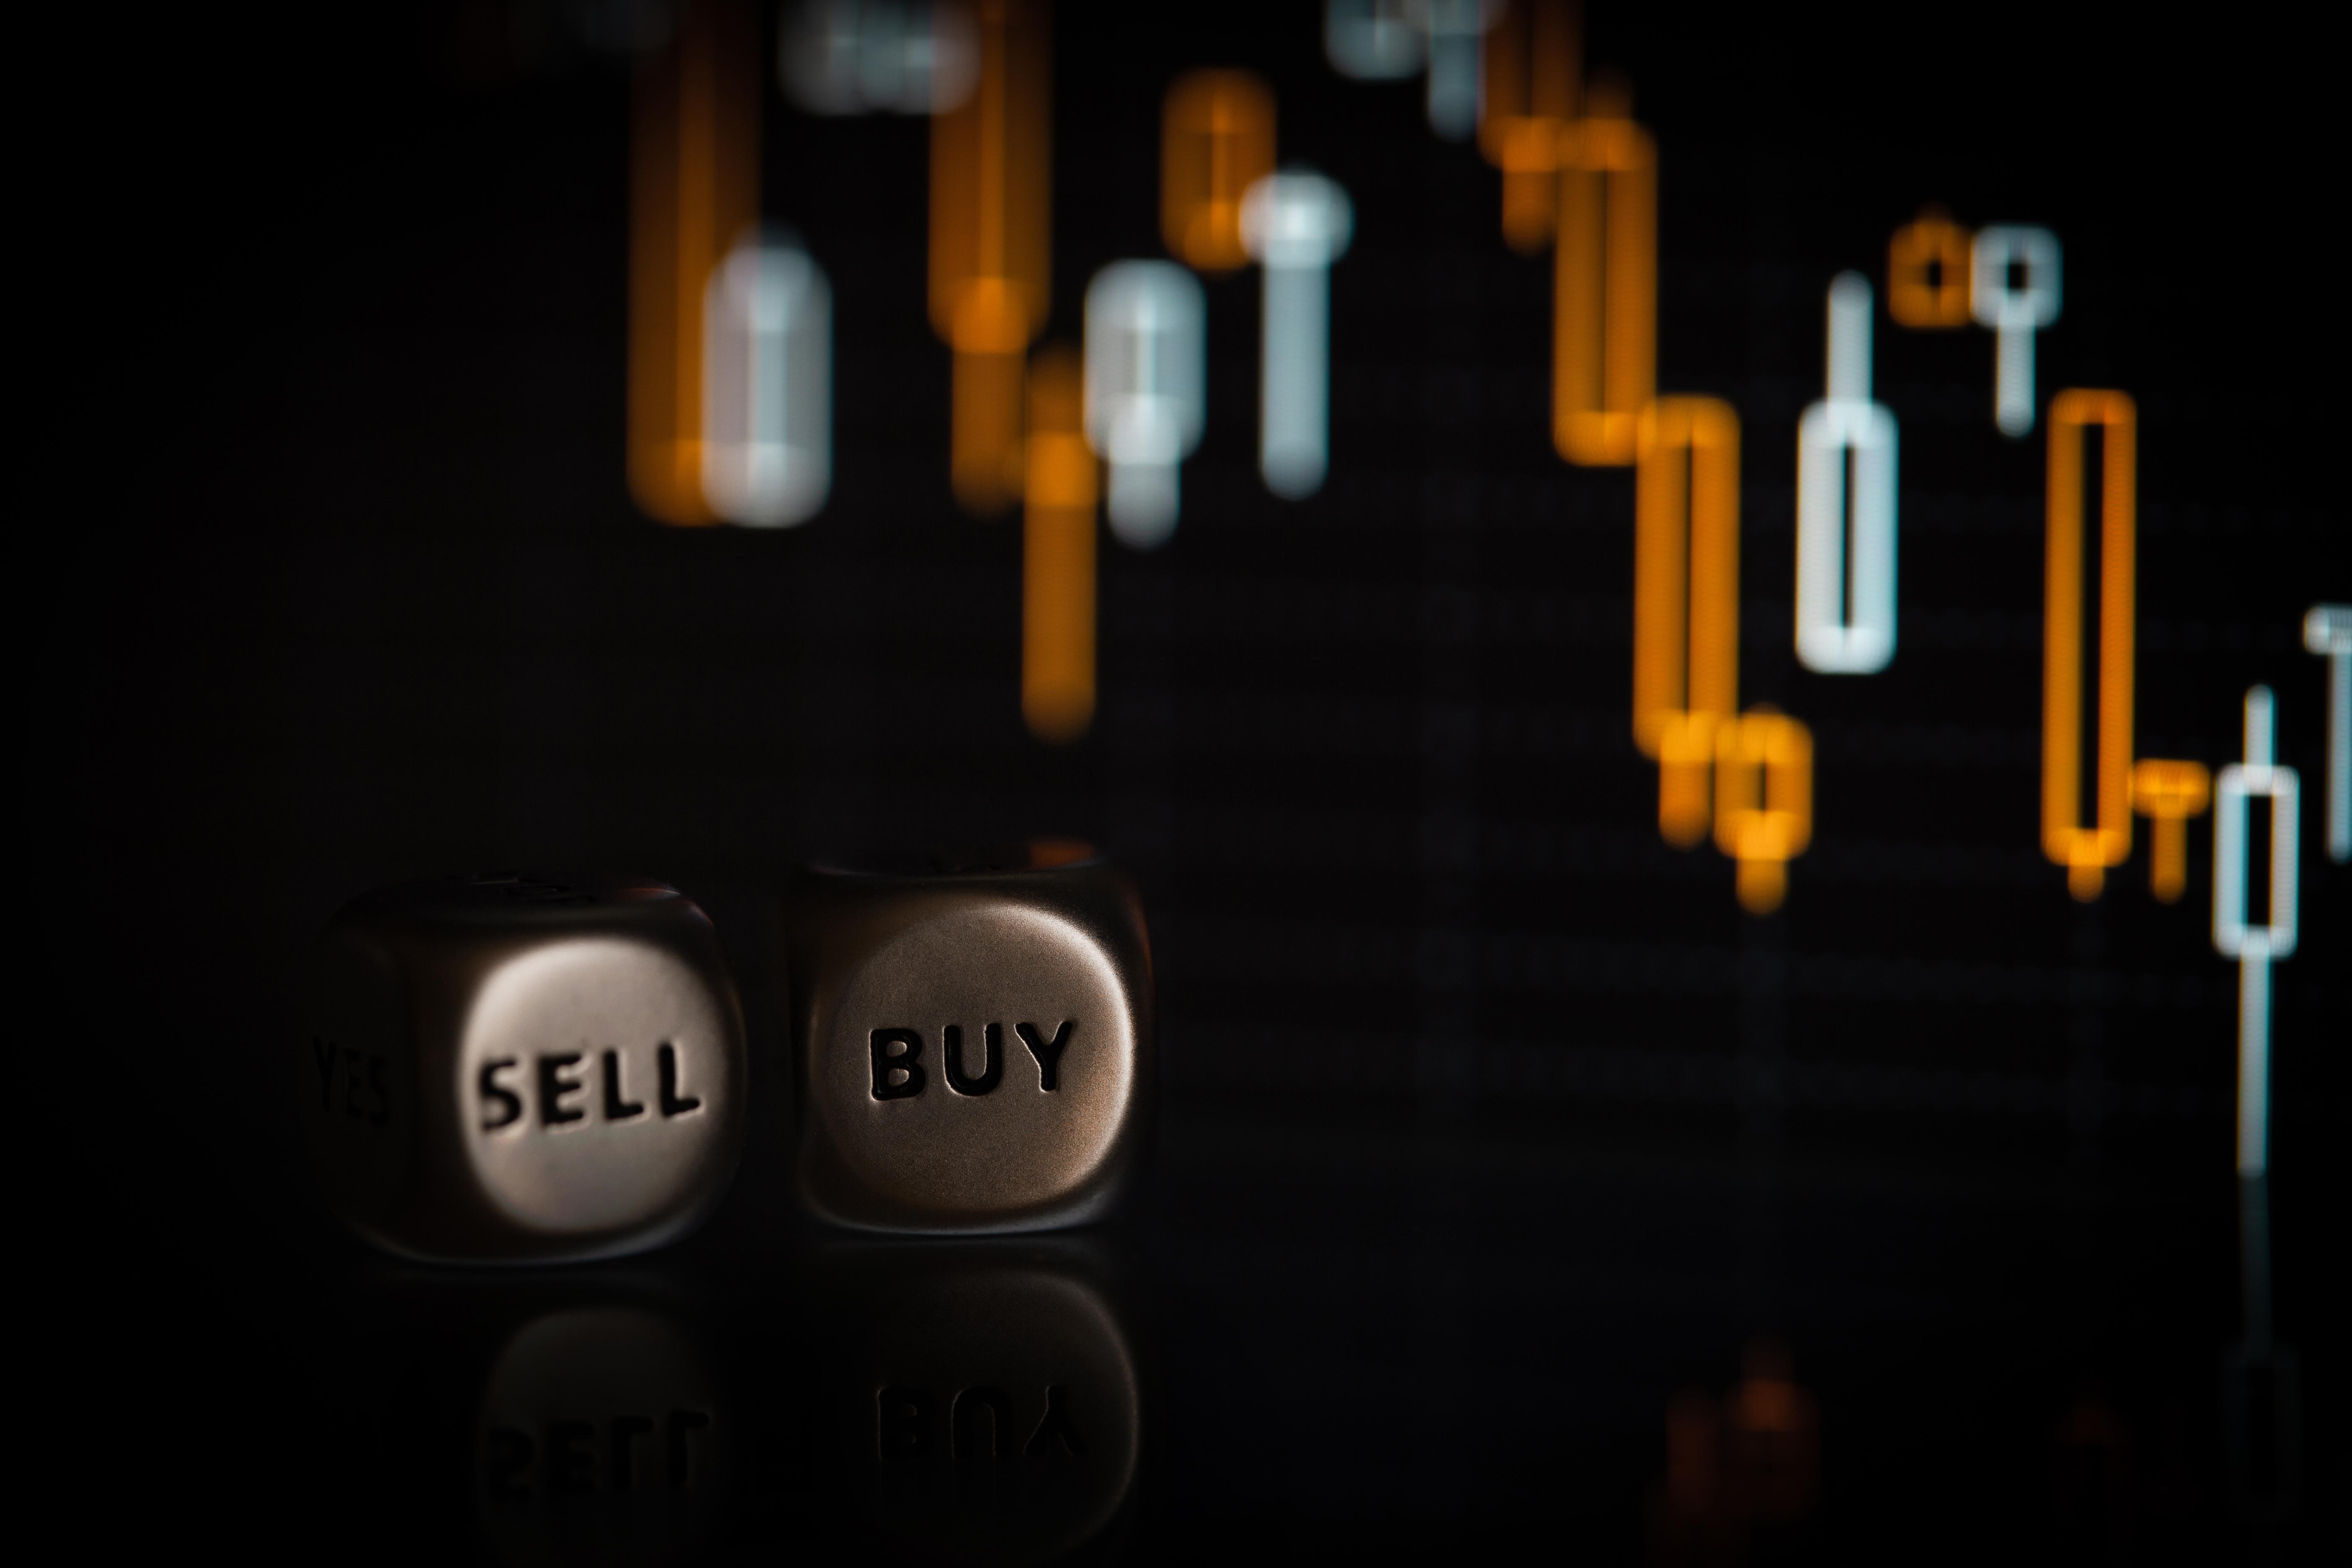 Stocks Finally Pullback - Where Do We Go From Here?  Thumbnail